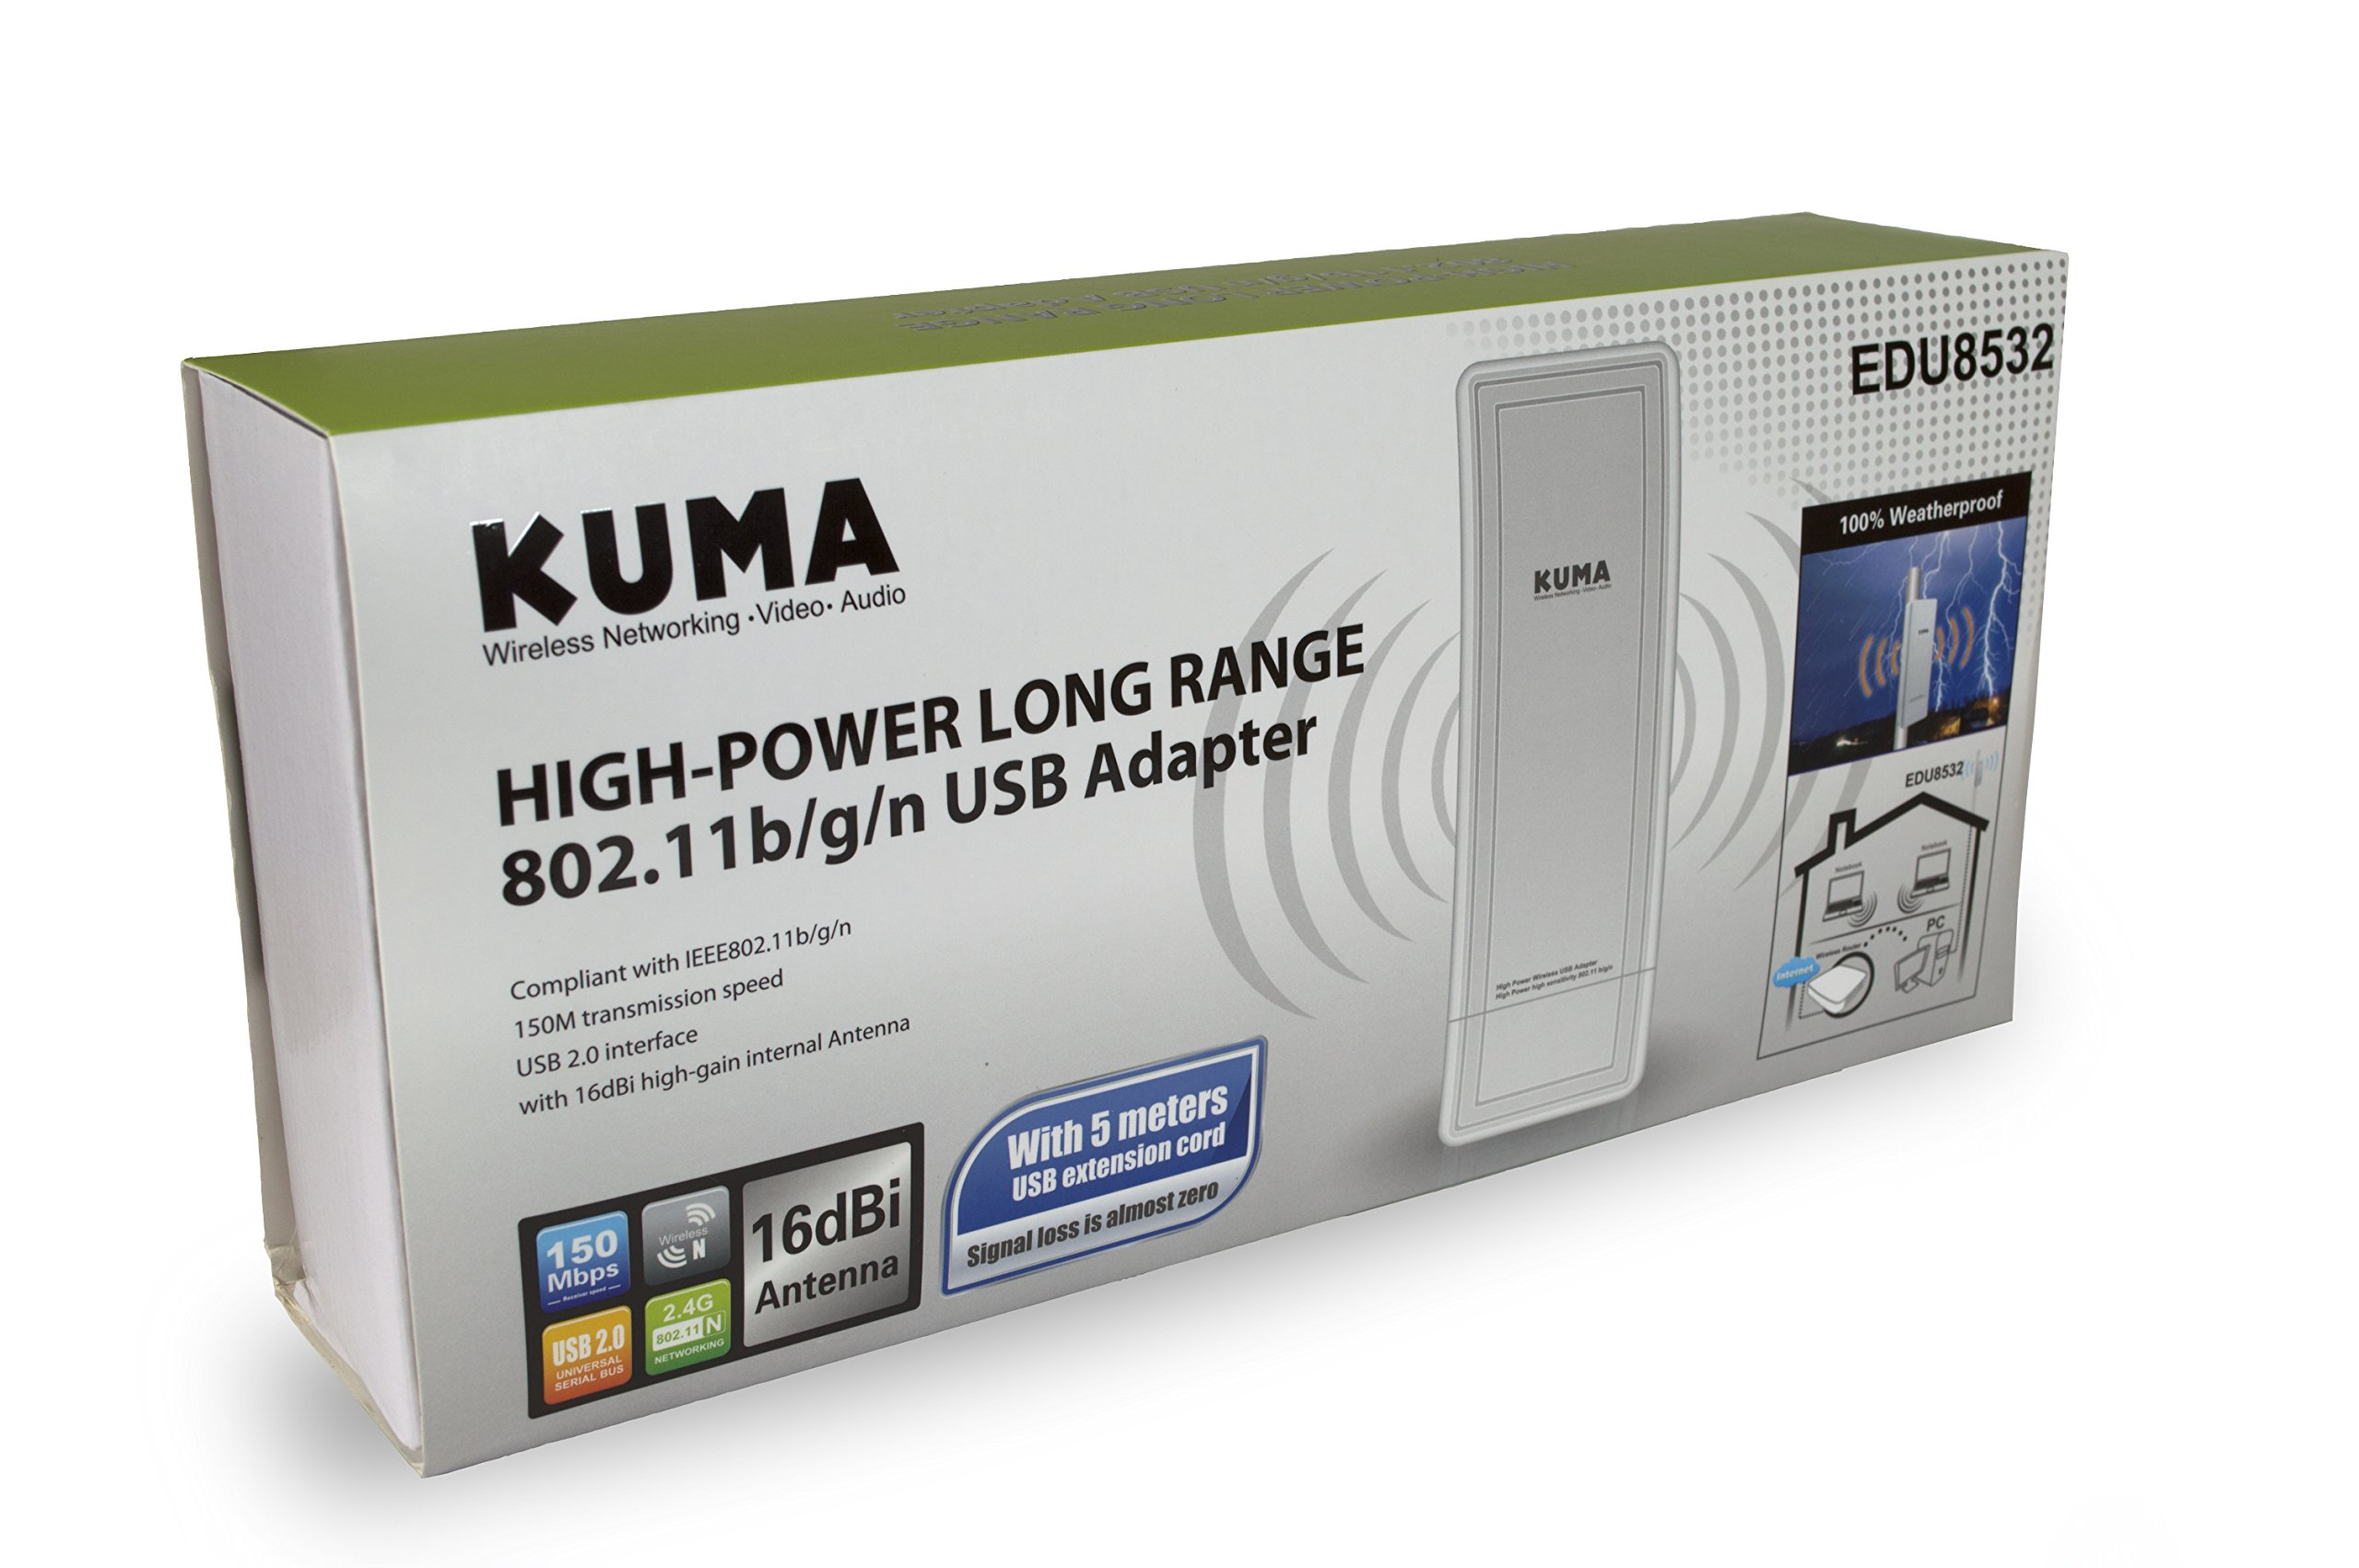 KUMA High Power Long Range Wireless Outdoor RV/Boat USB WiFi Signal Booster/Extender Antenna for Microsoft Windows PCs